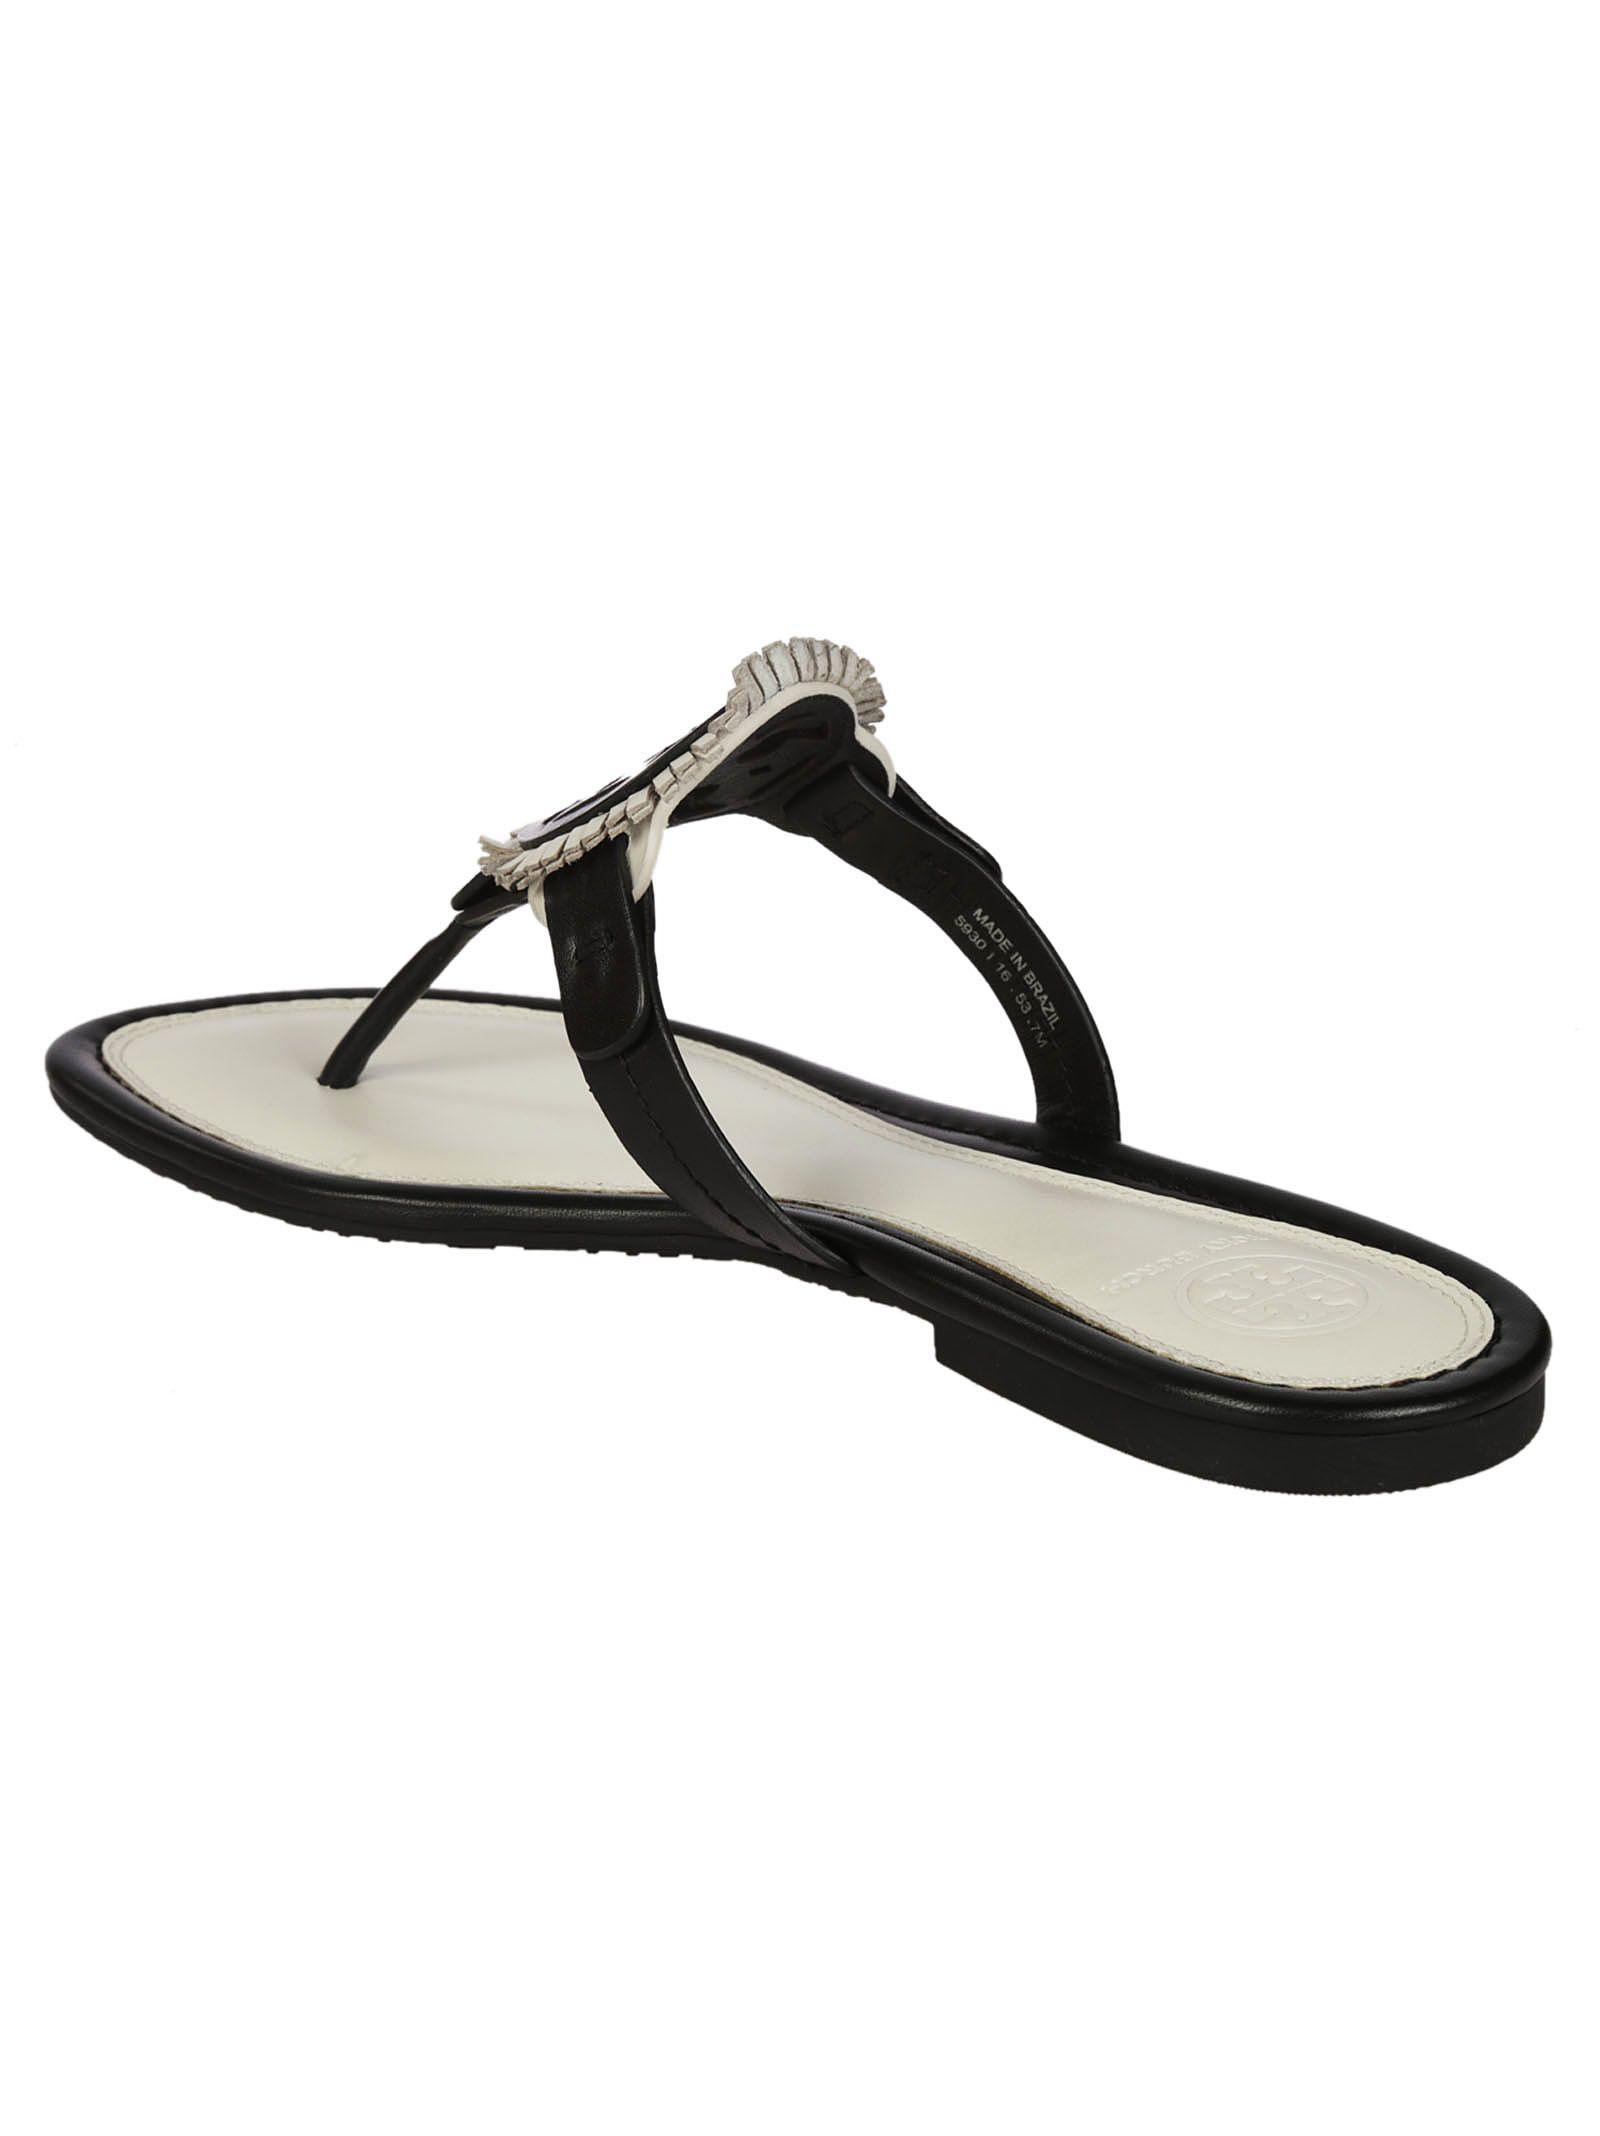 cf0c3f42ba2b Tory Burch Tory Burch Miller Fringe Flat Sandals - Black - 6703076 ...